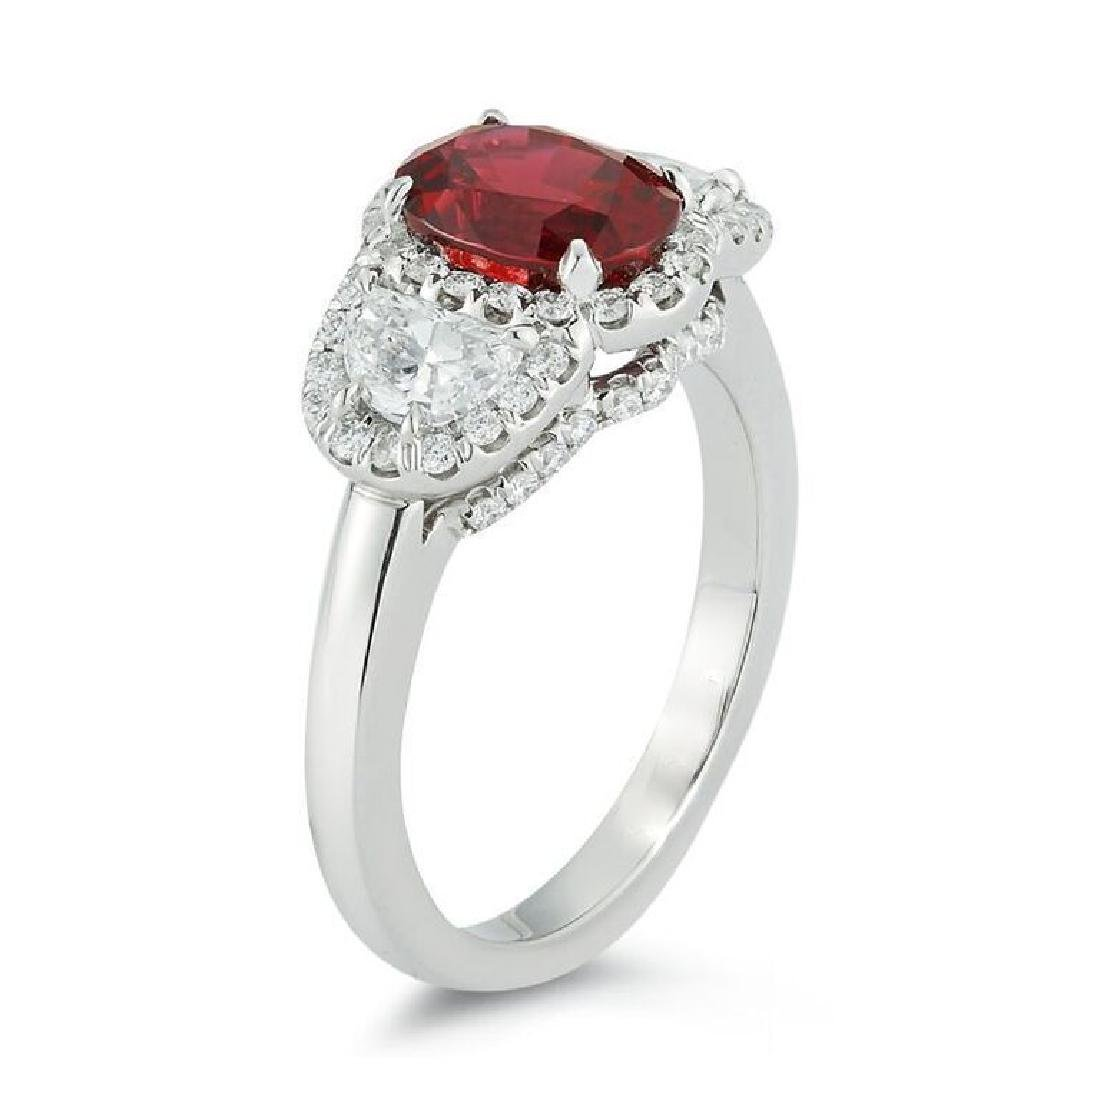 PLATINUM RUBY & DIAMOND RING